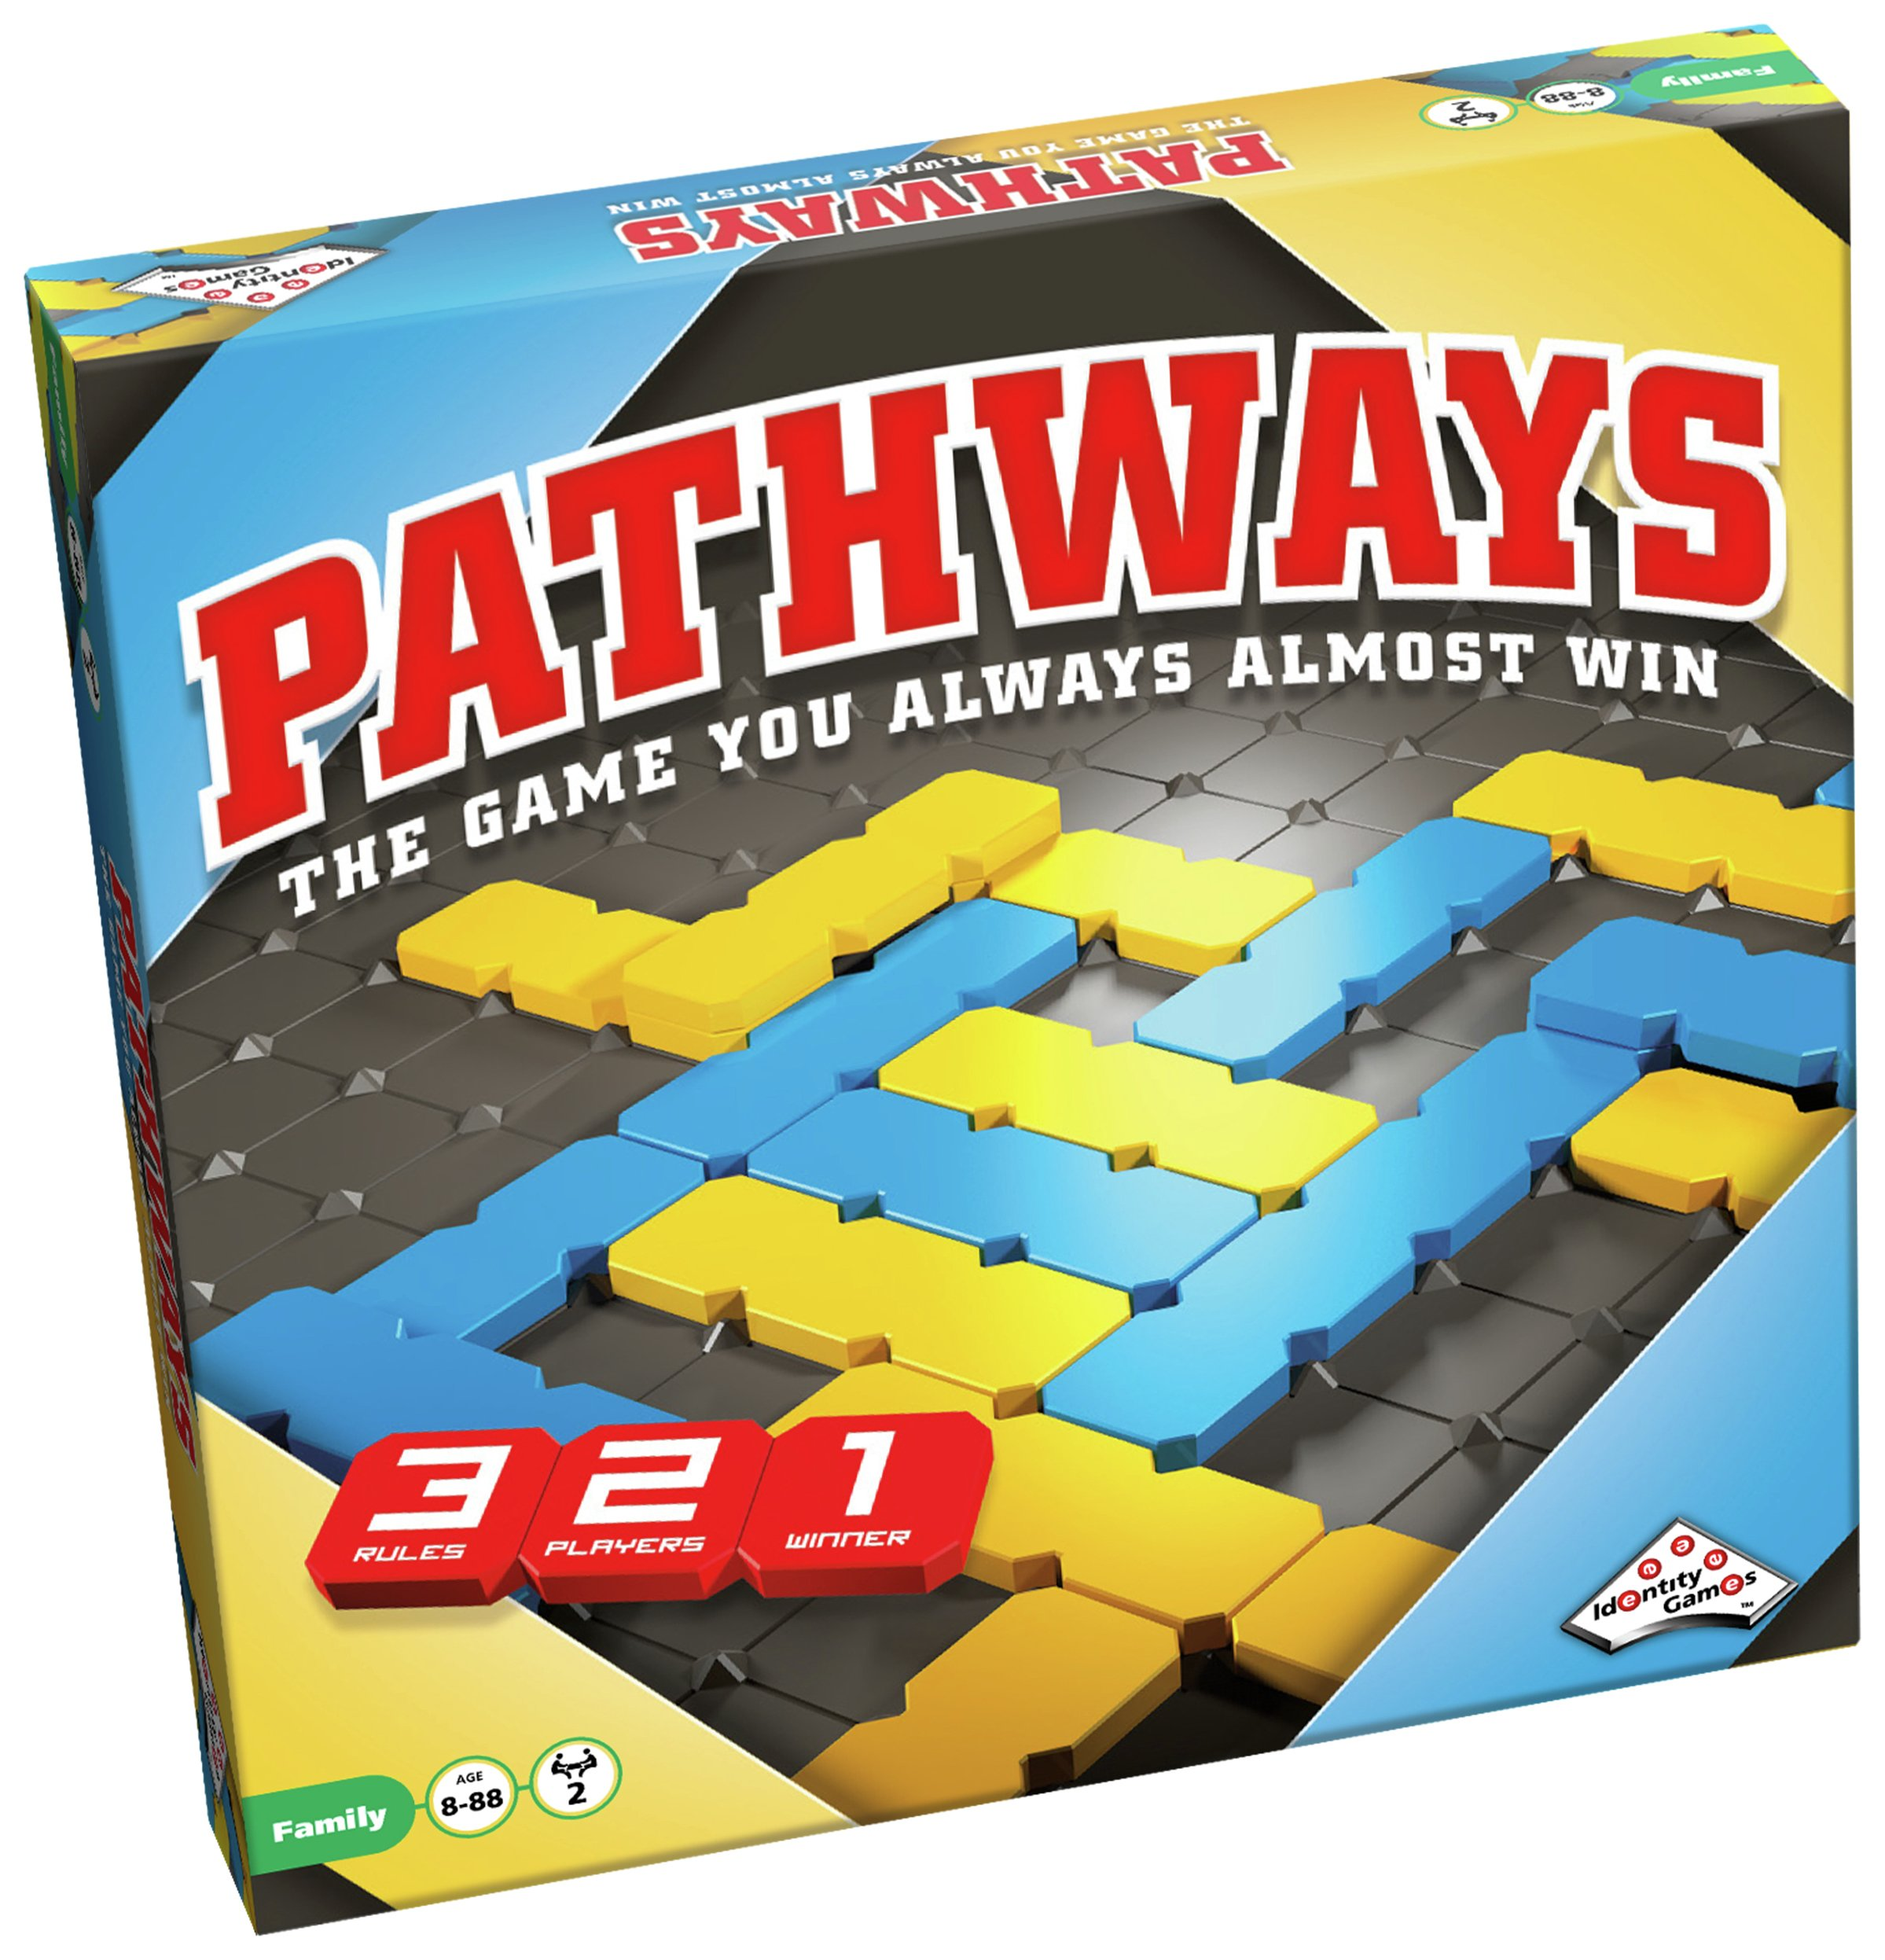 Image of Paul Lamond Games Pathways Game.